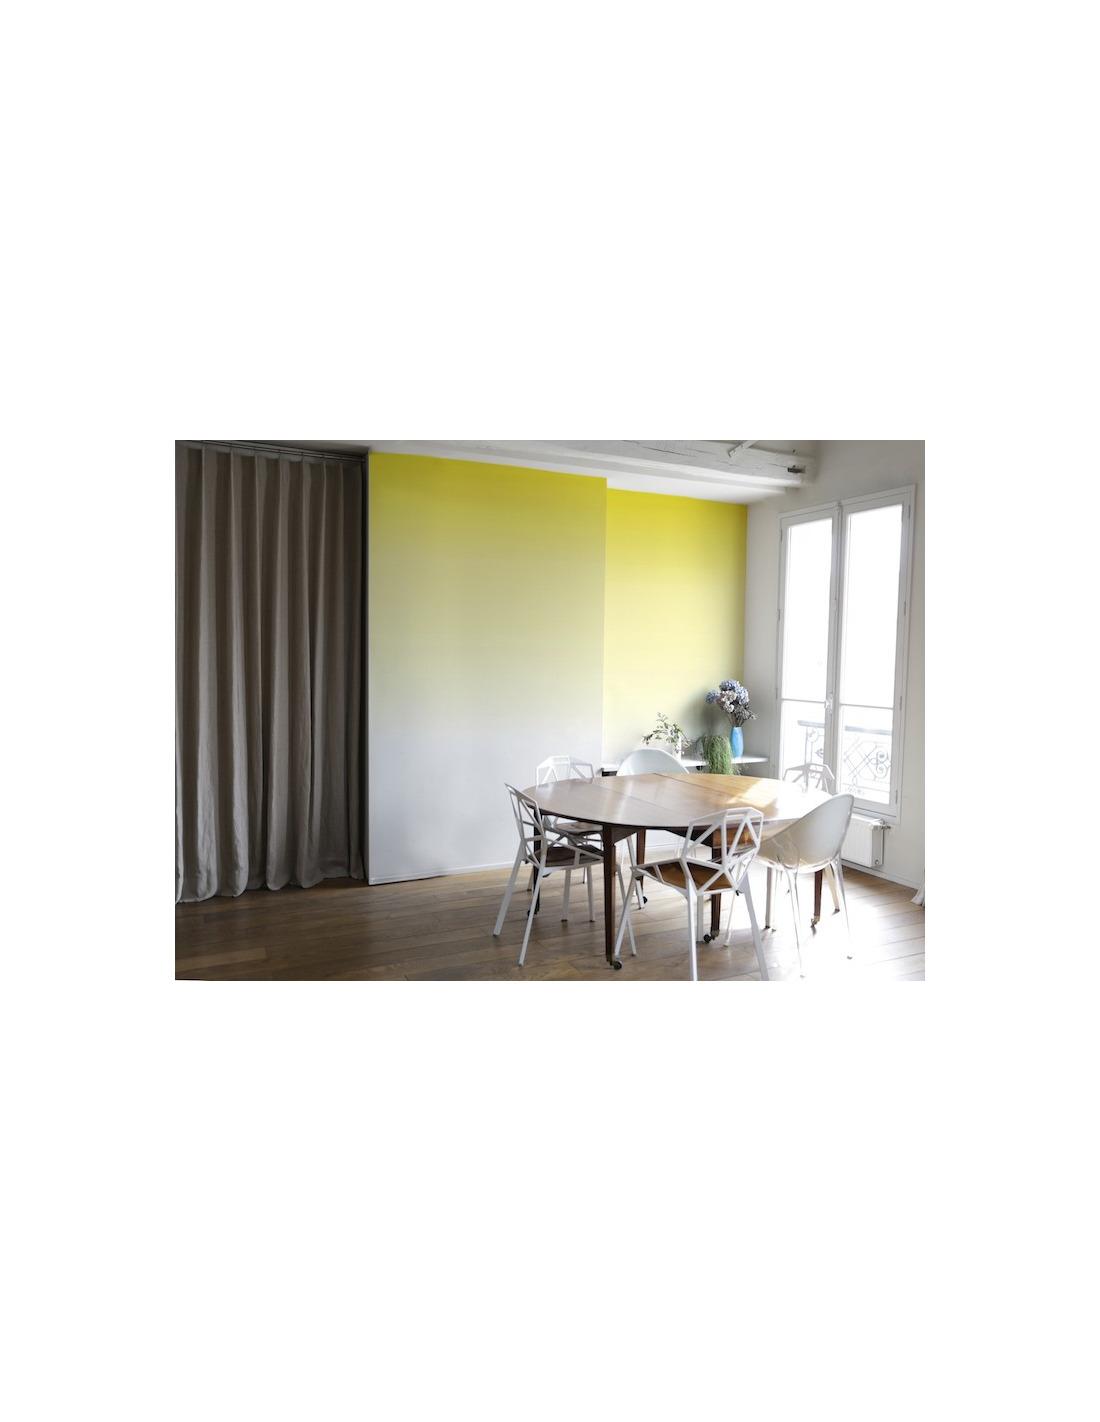 papier peint design intiss sunset citron pr t poser by a a cooren otoko. Black Bedroom Furniture Sets. Home Design Ideas